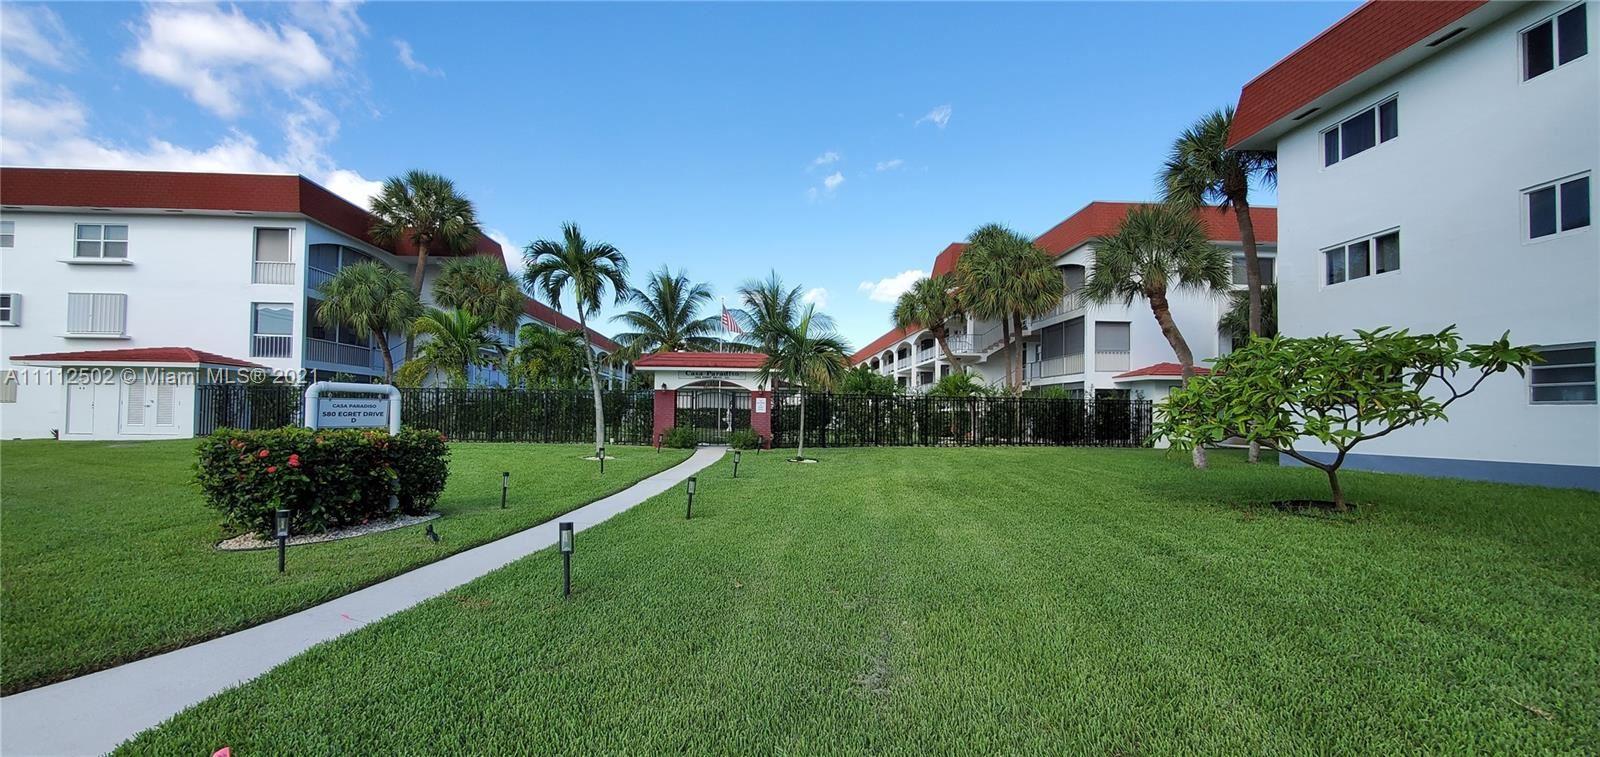 Photo of 580 Egret Dr #322, Hallandale Beach, FL 33009 (MLS # A11112502)